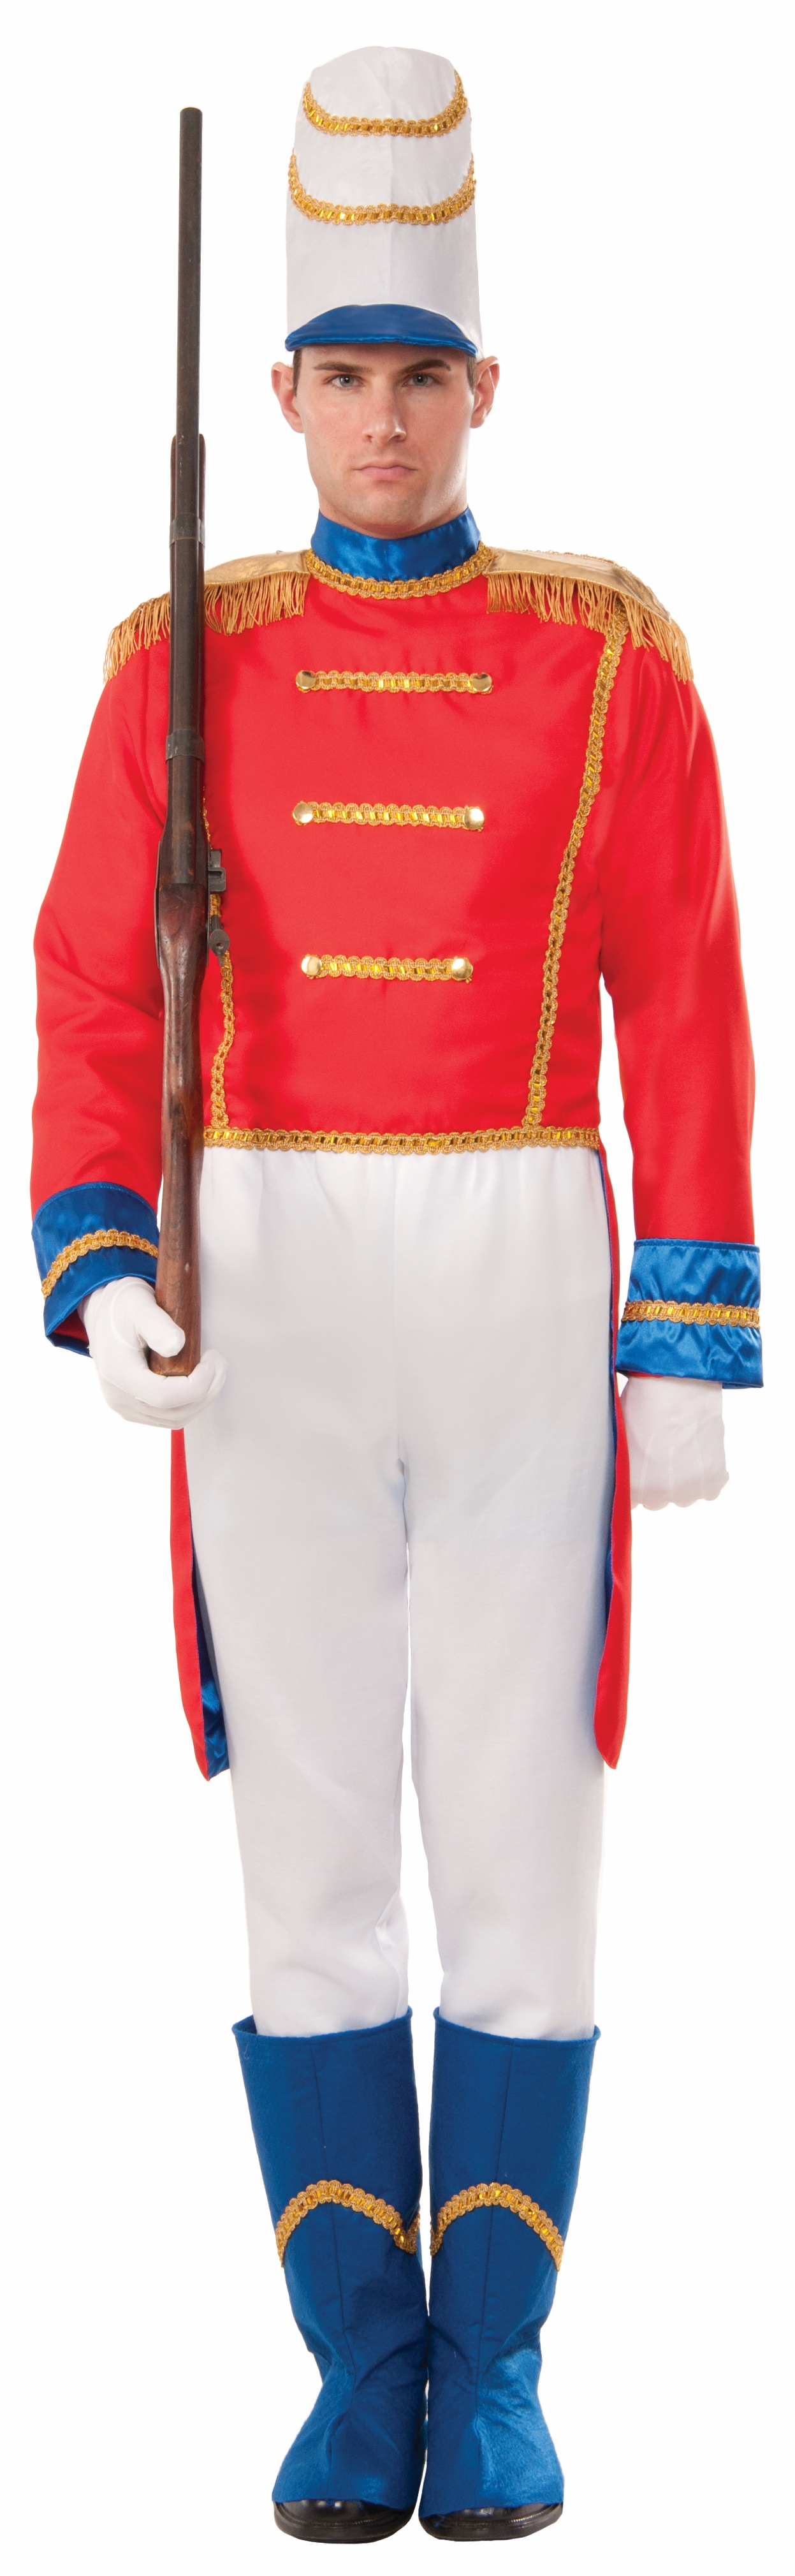 Toy Soldier Adult Costume Nutcracker Uniform Christmas ...